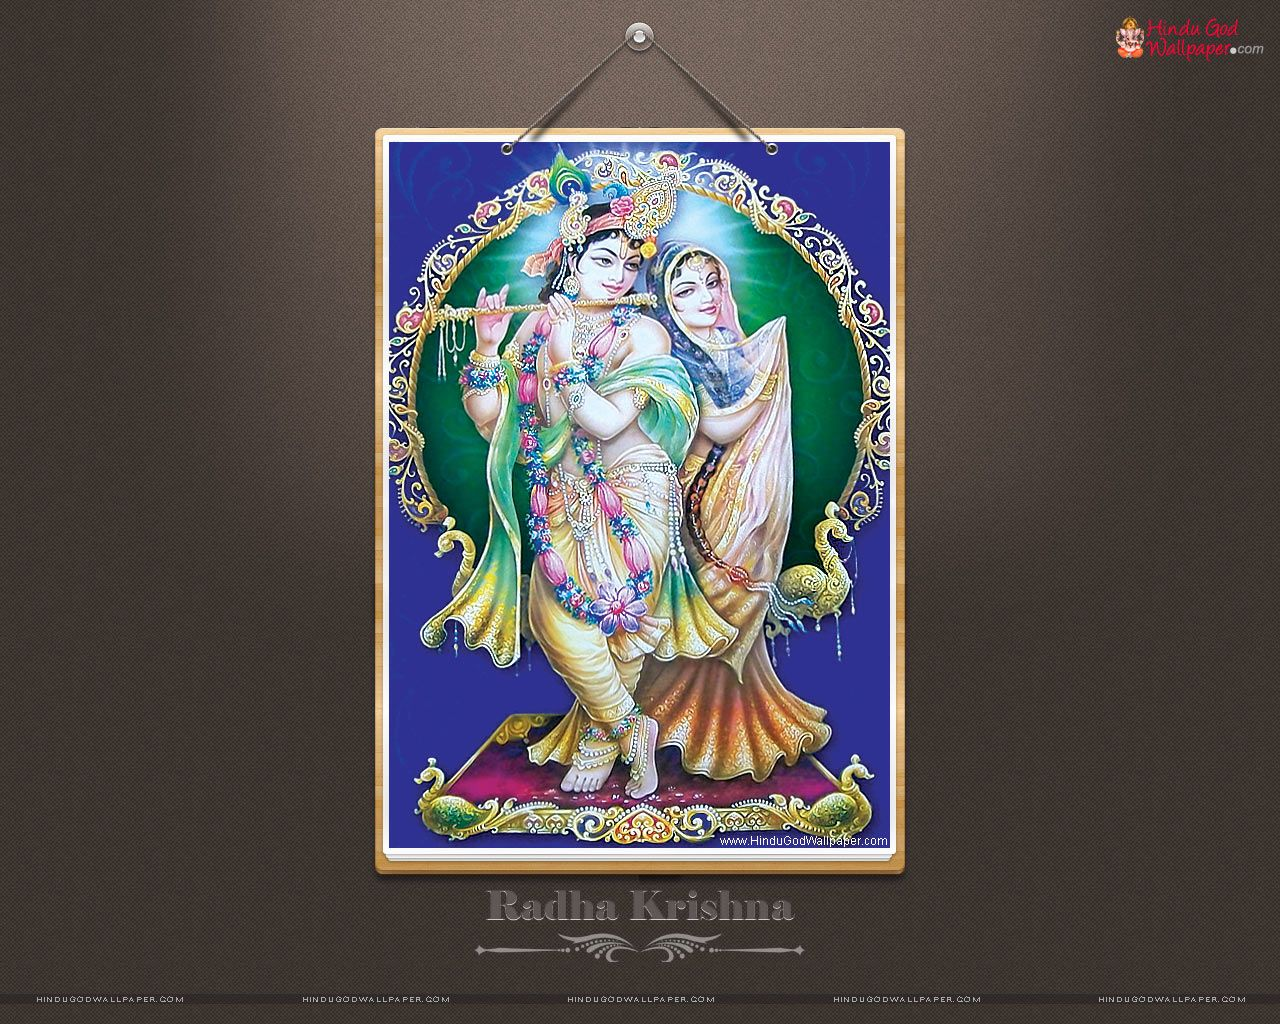 Radha krishna wallpapers full size - Radha Krishna Hd Wallpapers Full Size Download